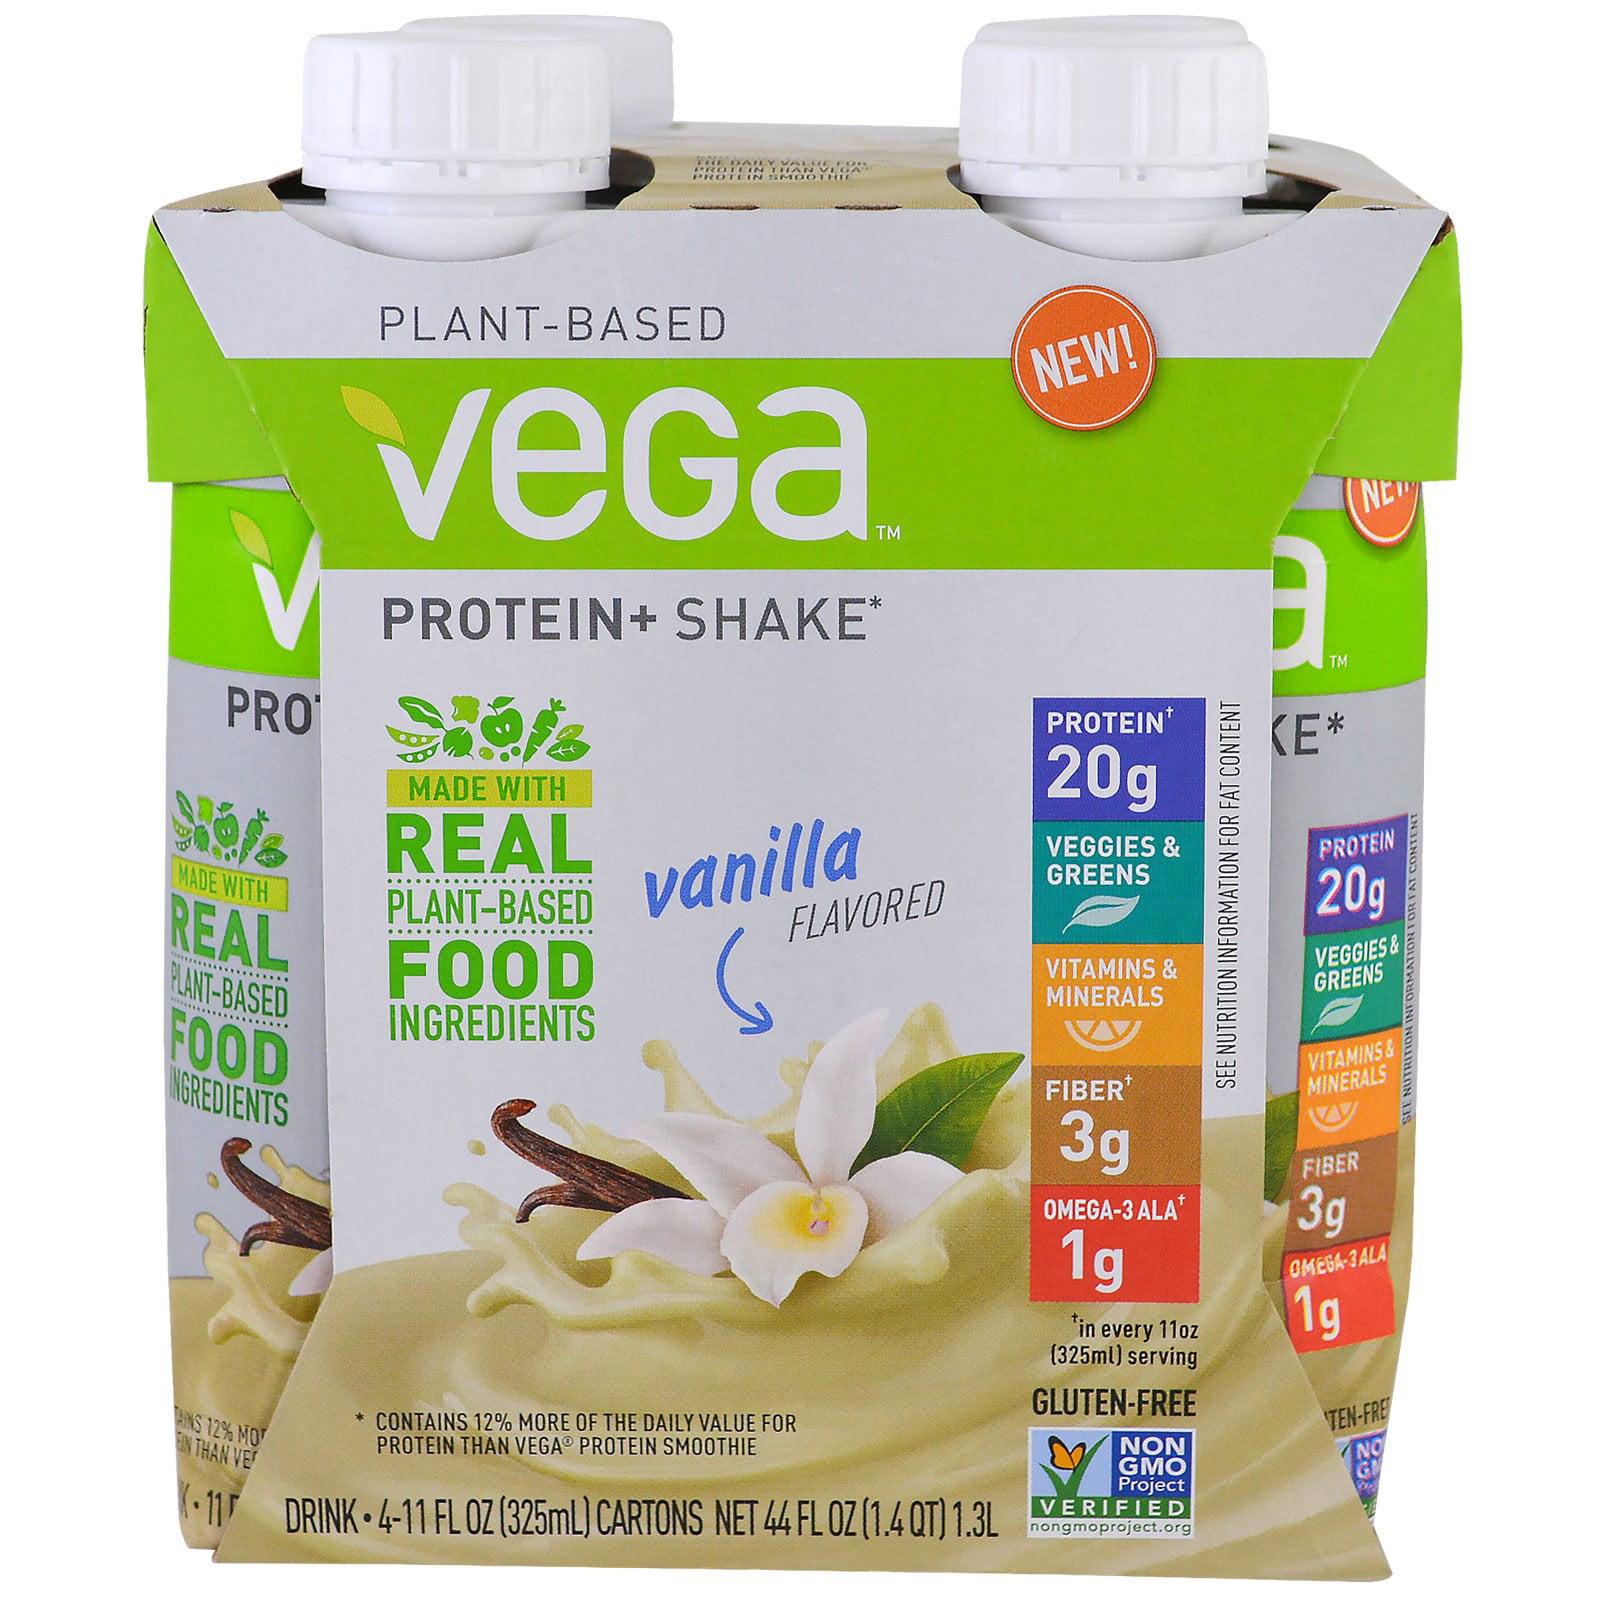 Vega Vegan Protein Shake, Vanilla, 20g Protein, 4 Ct